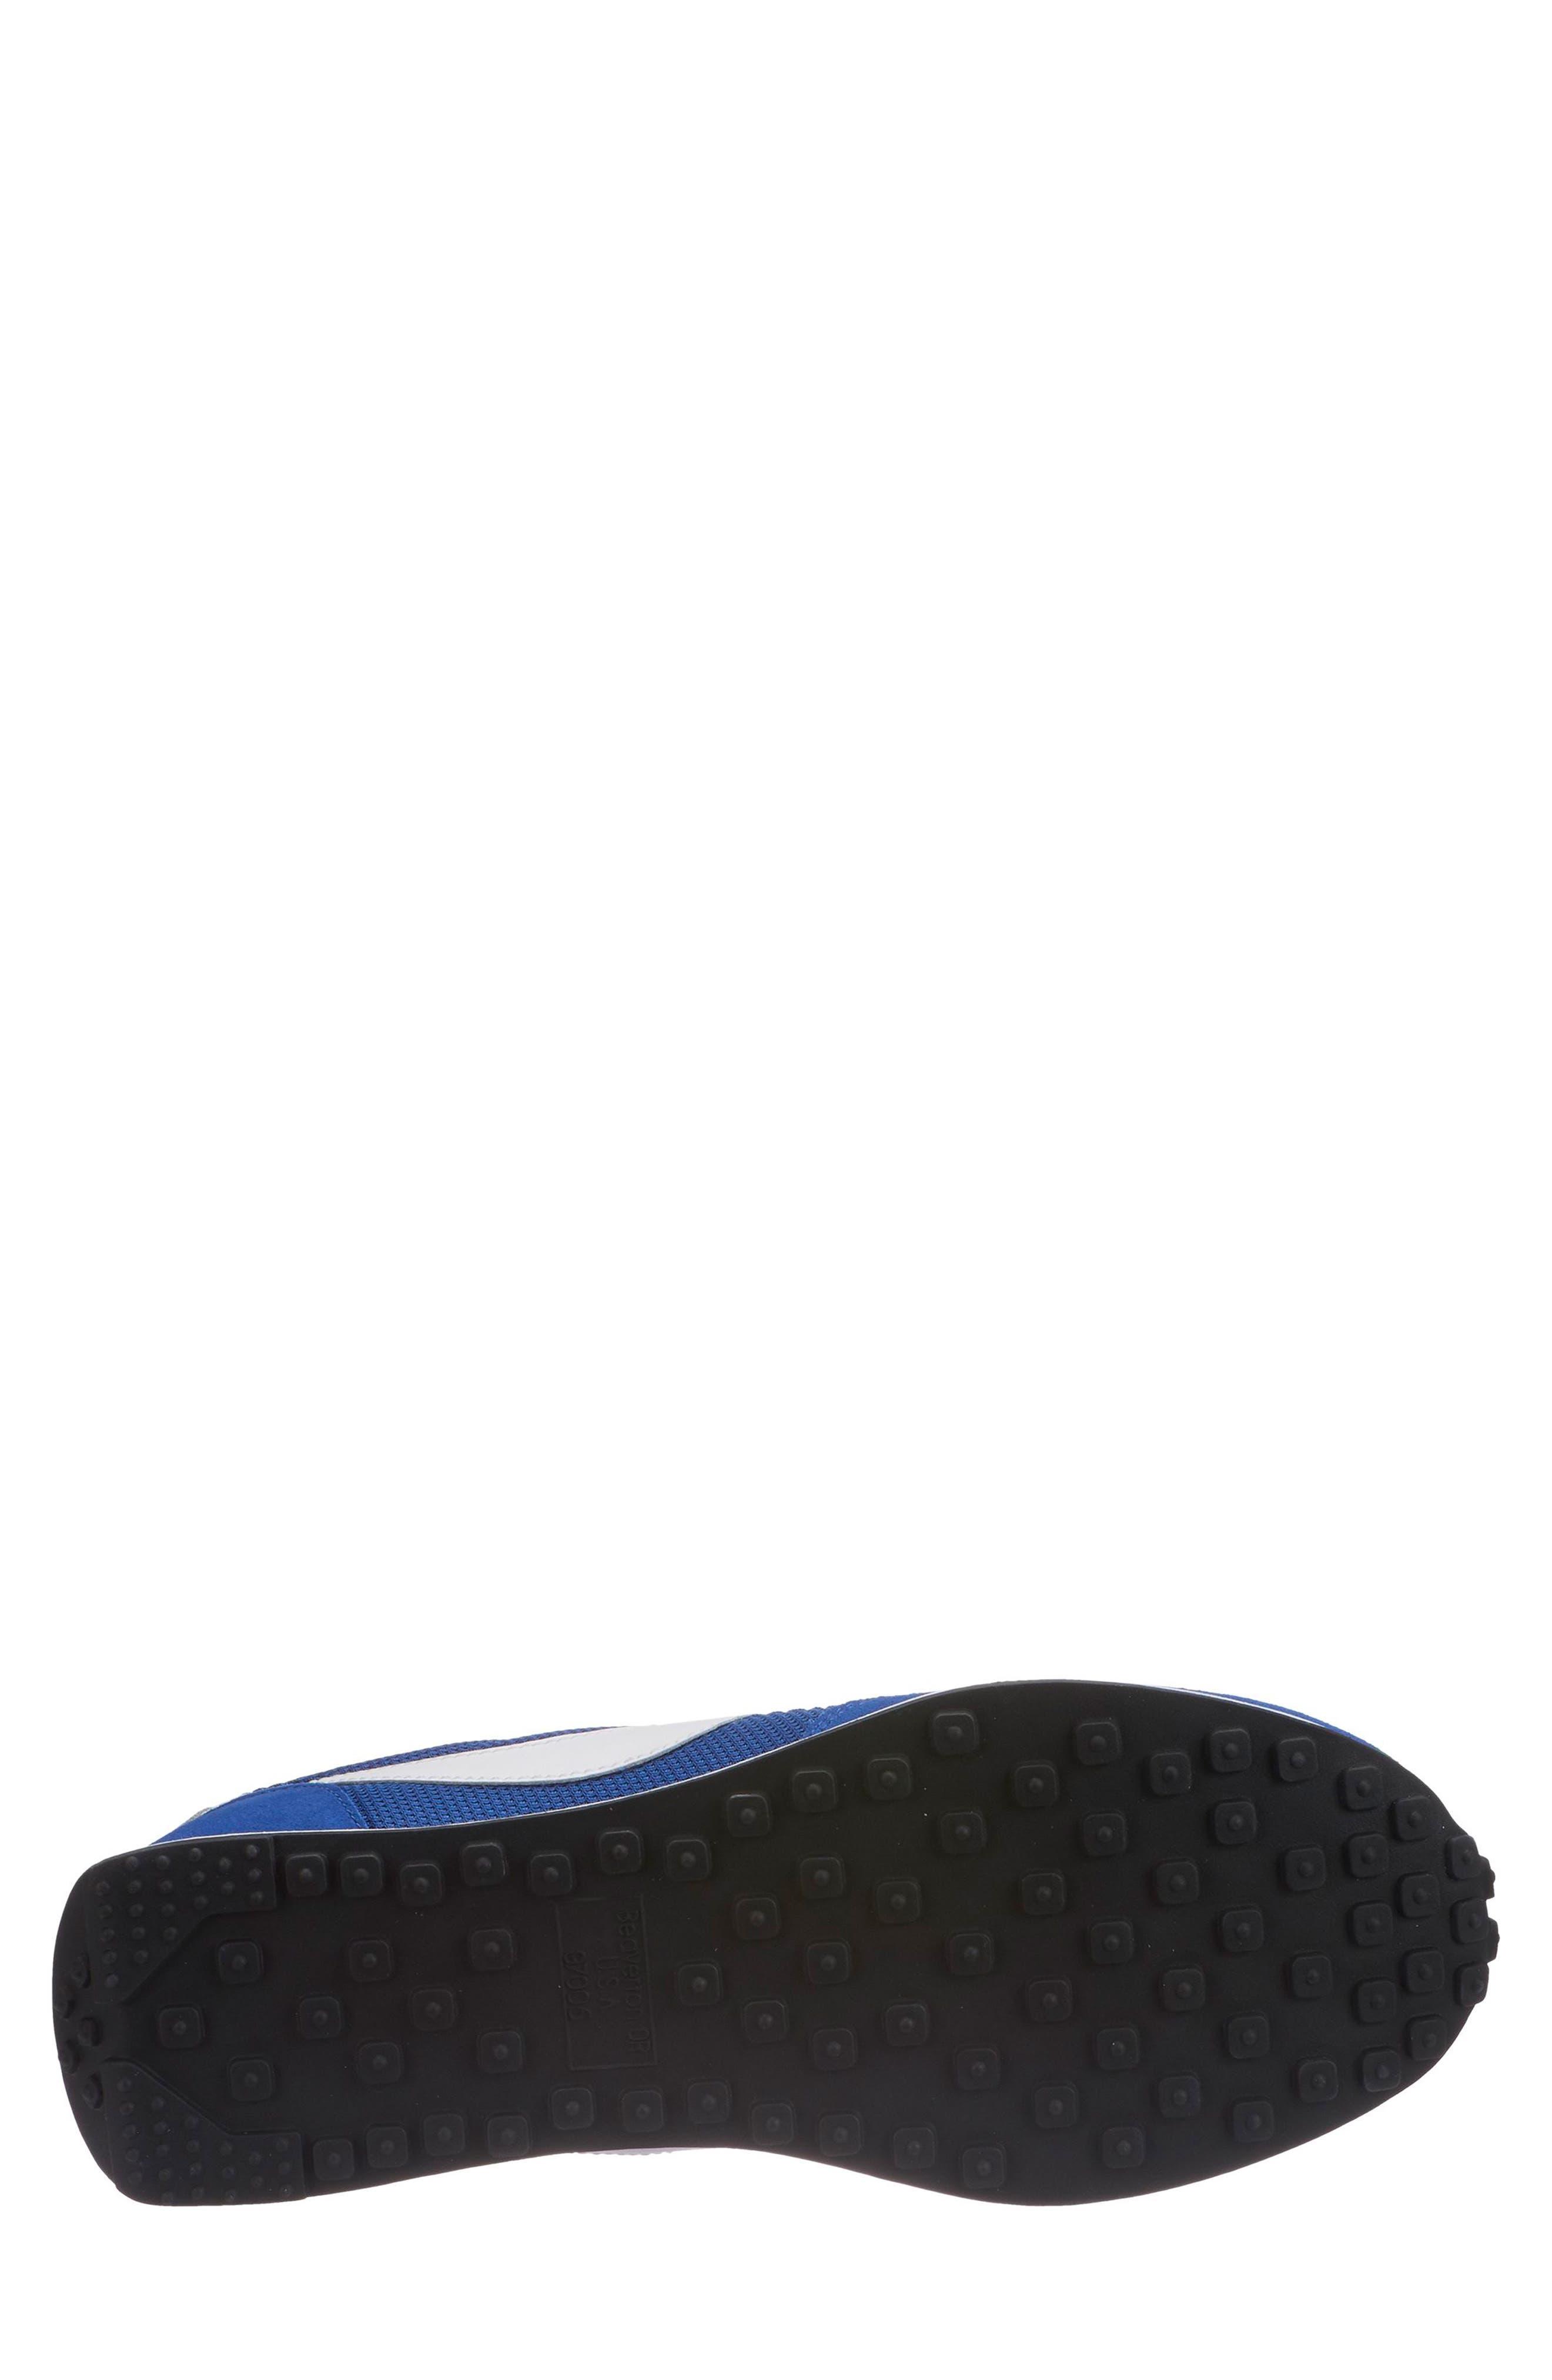 NIKE, Air Tailwind '79 Sneaker, Alternate thumbnail 2, color, 405